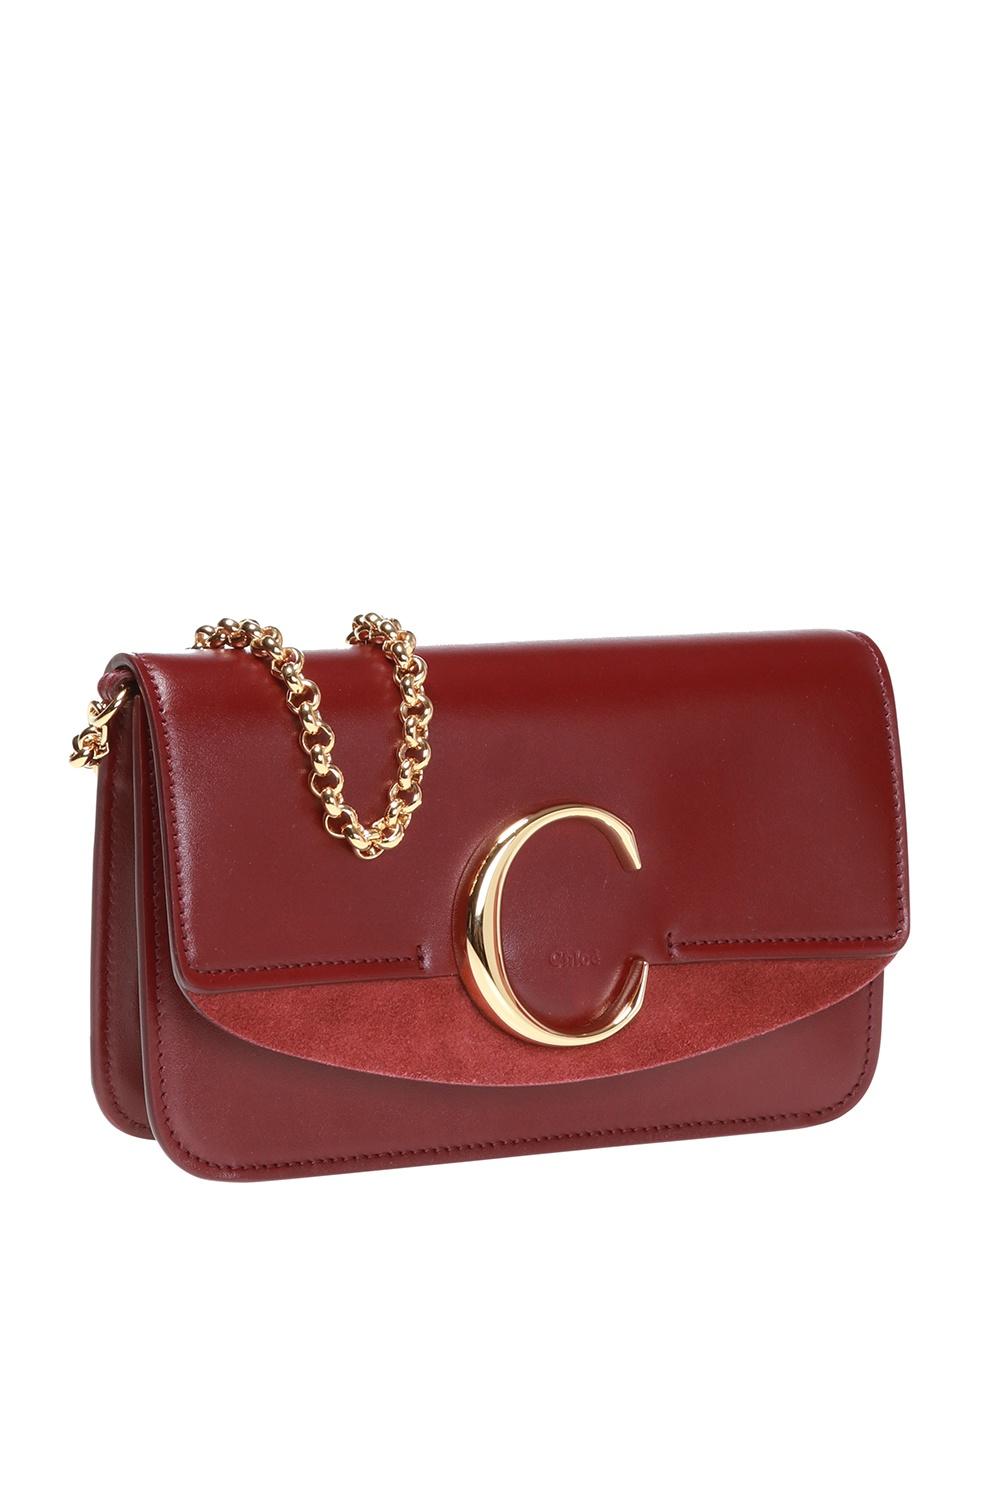 Chloé 'Chloé C' shoulder bag